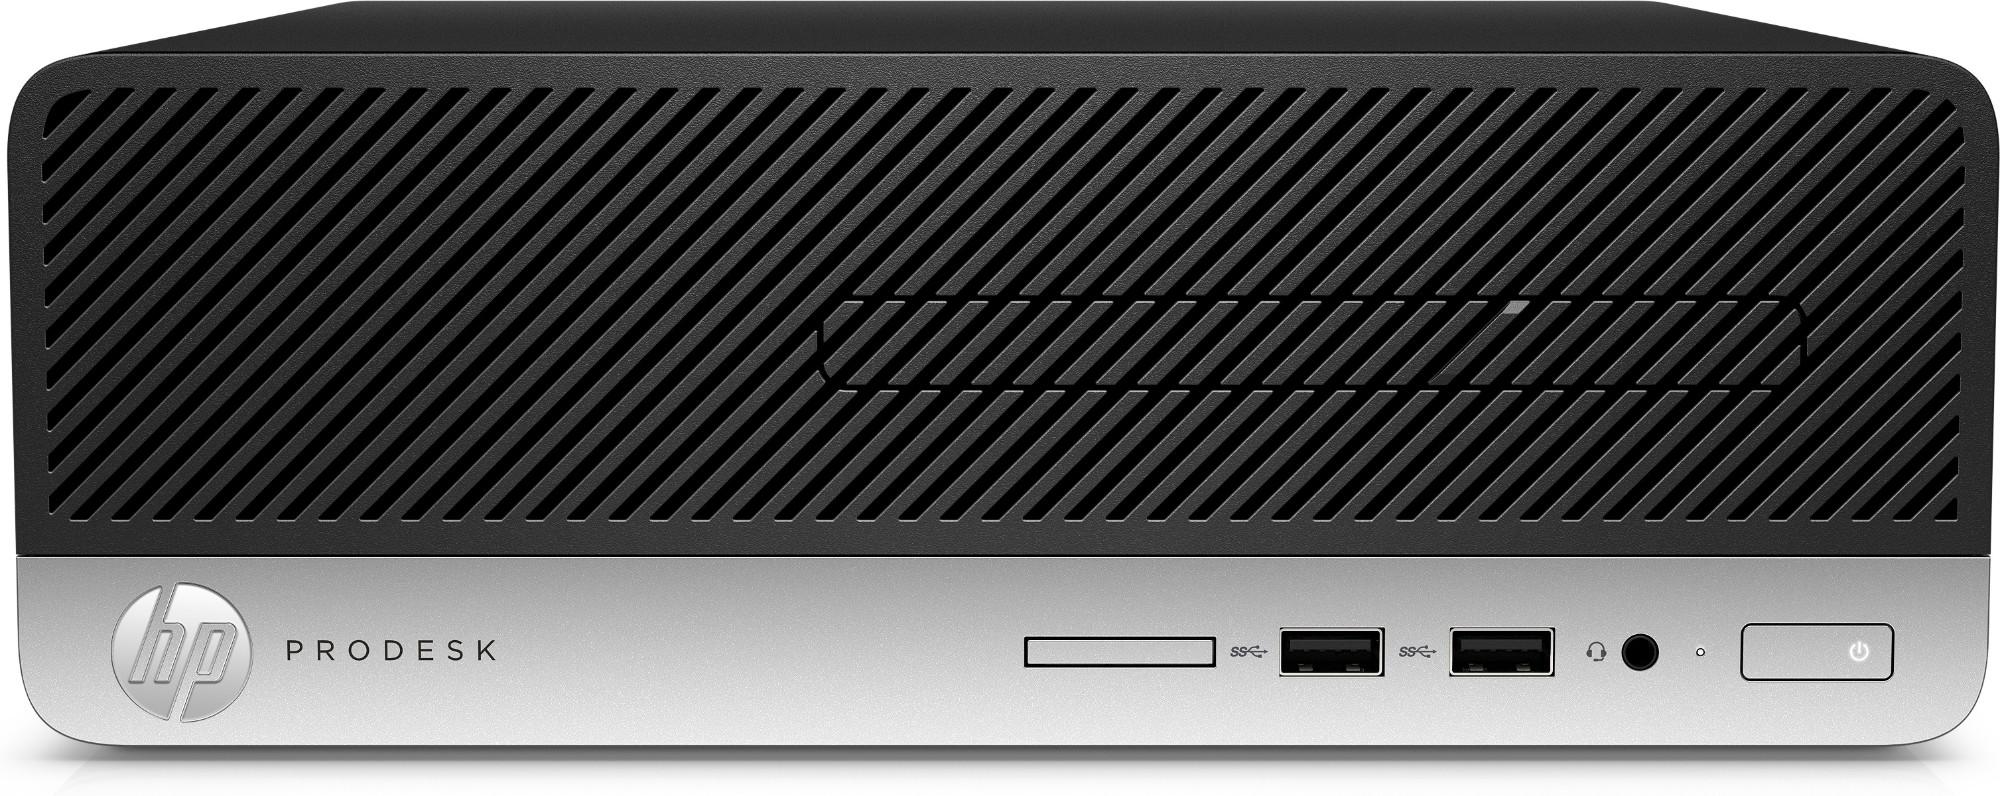 HP PRODESK 400 G6 9TH GEN INTEL CORE I7 I7-9700 8 GB DDR4-SDRAM 256 GB SSD BLACK SFF PC